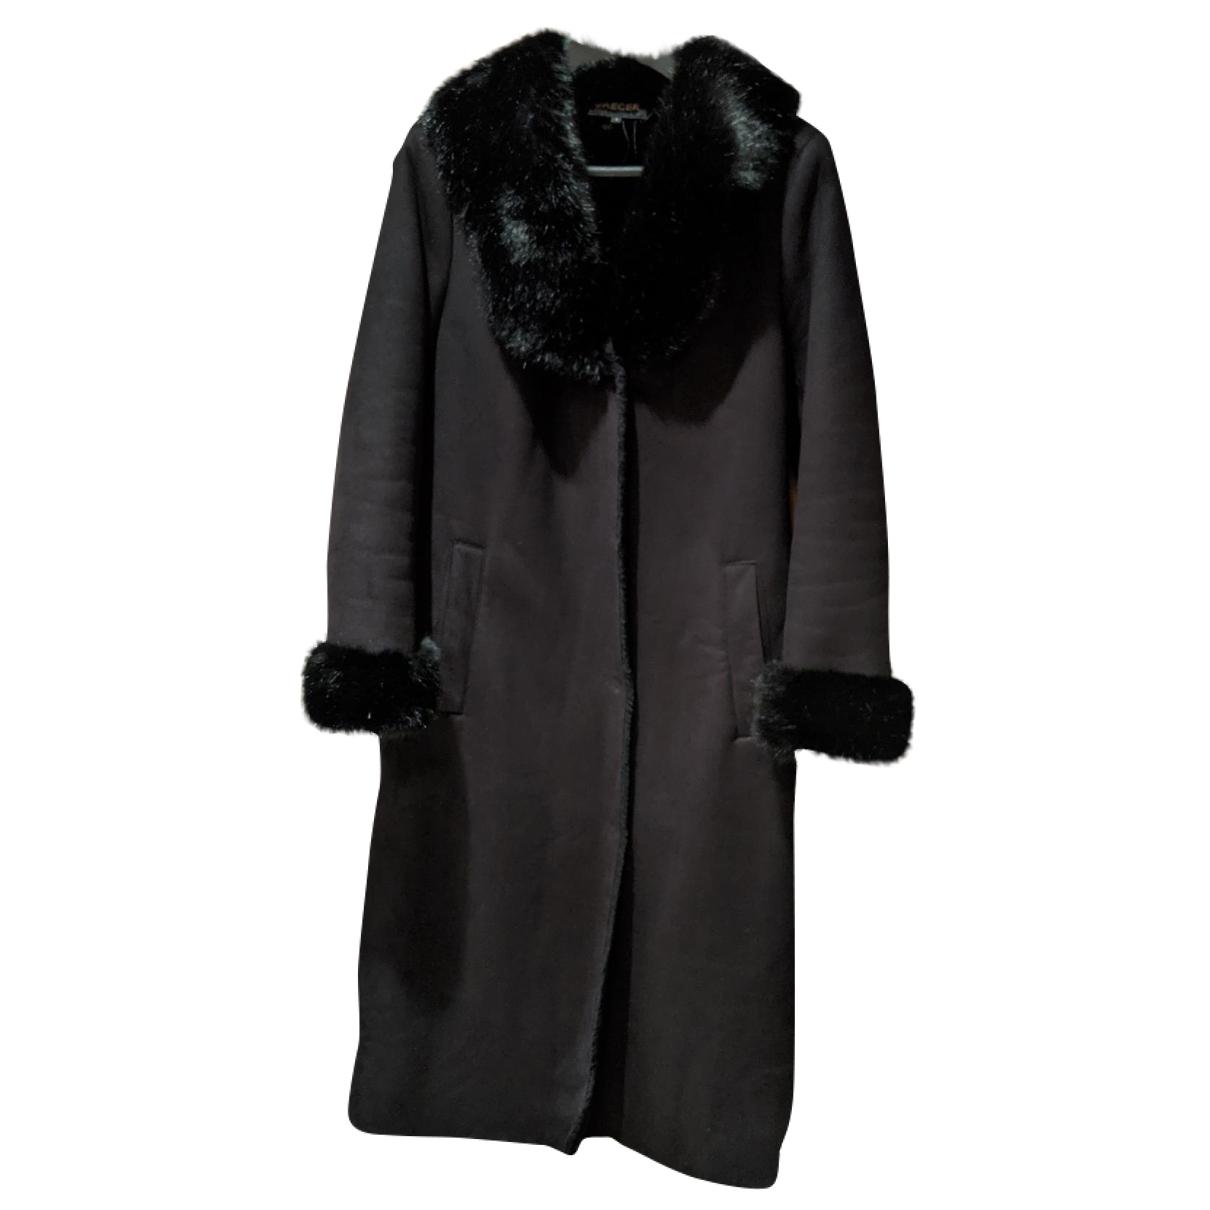 Jaeger \N Black coat for Women 8 UK